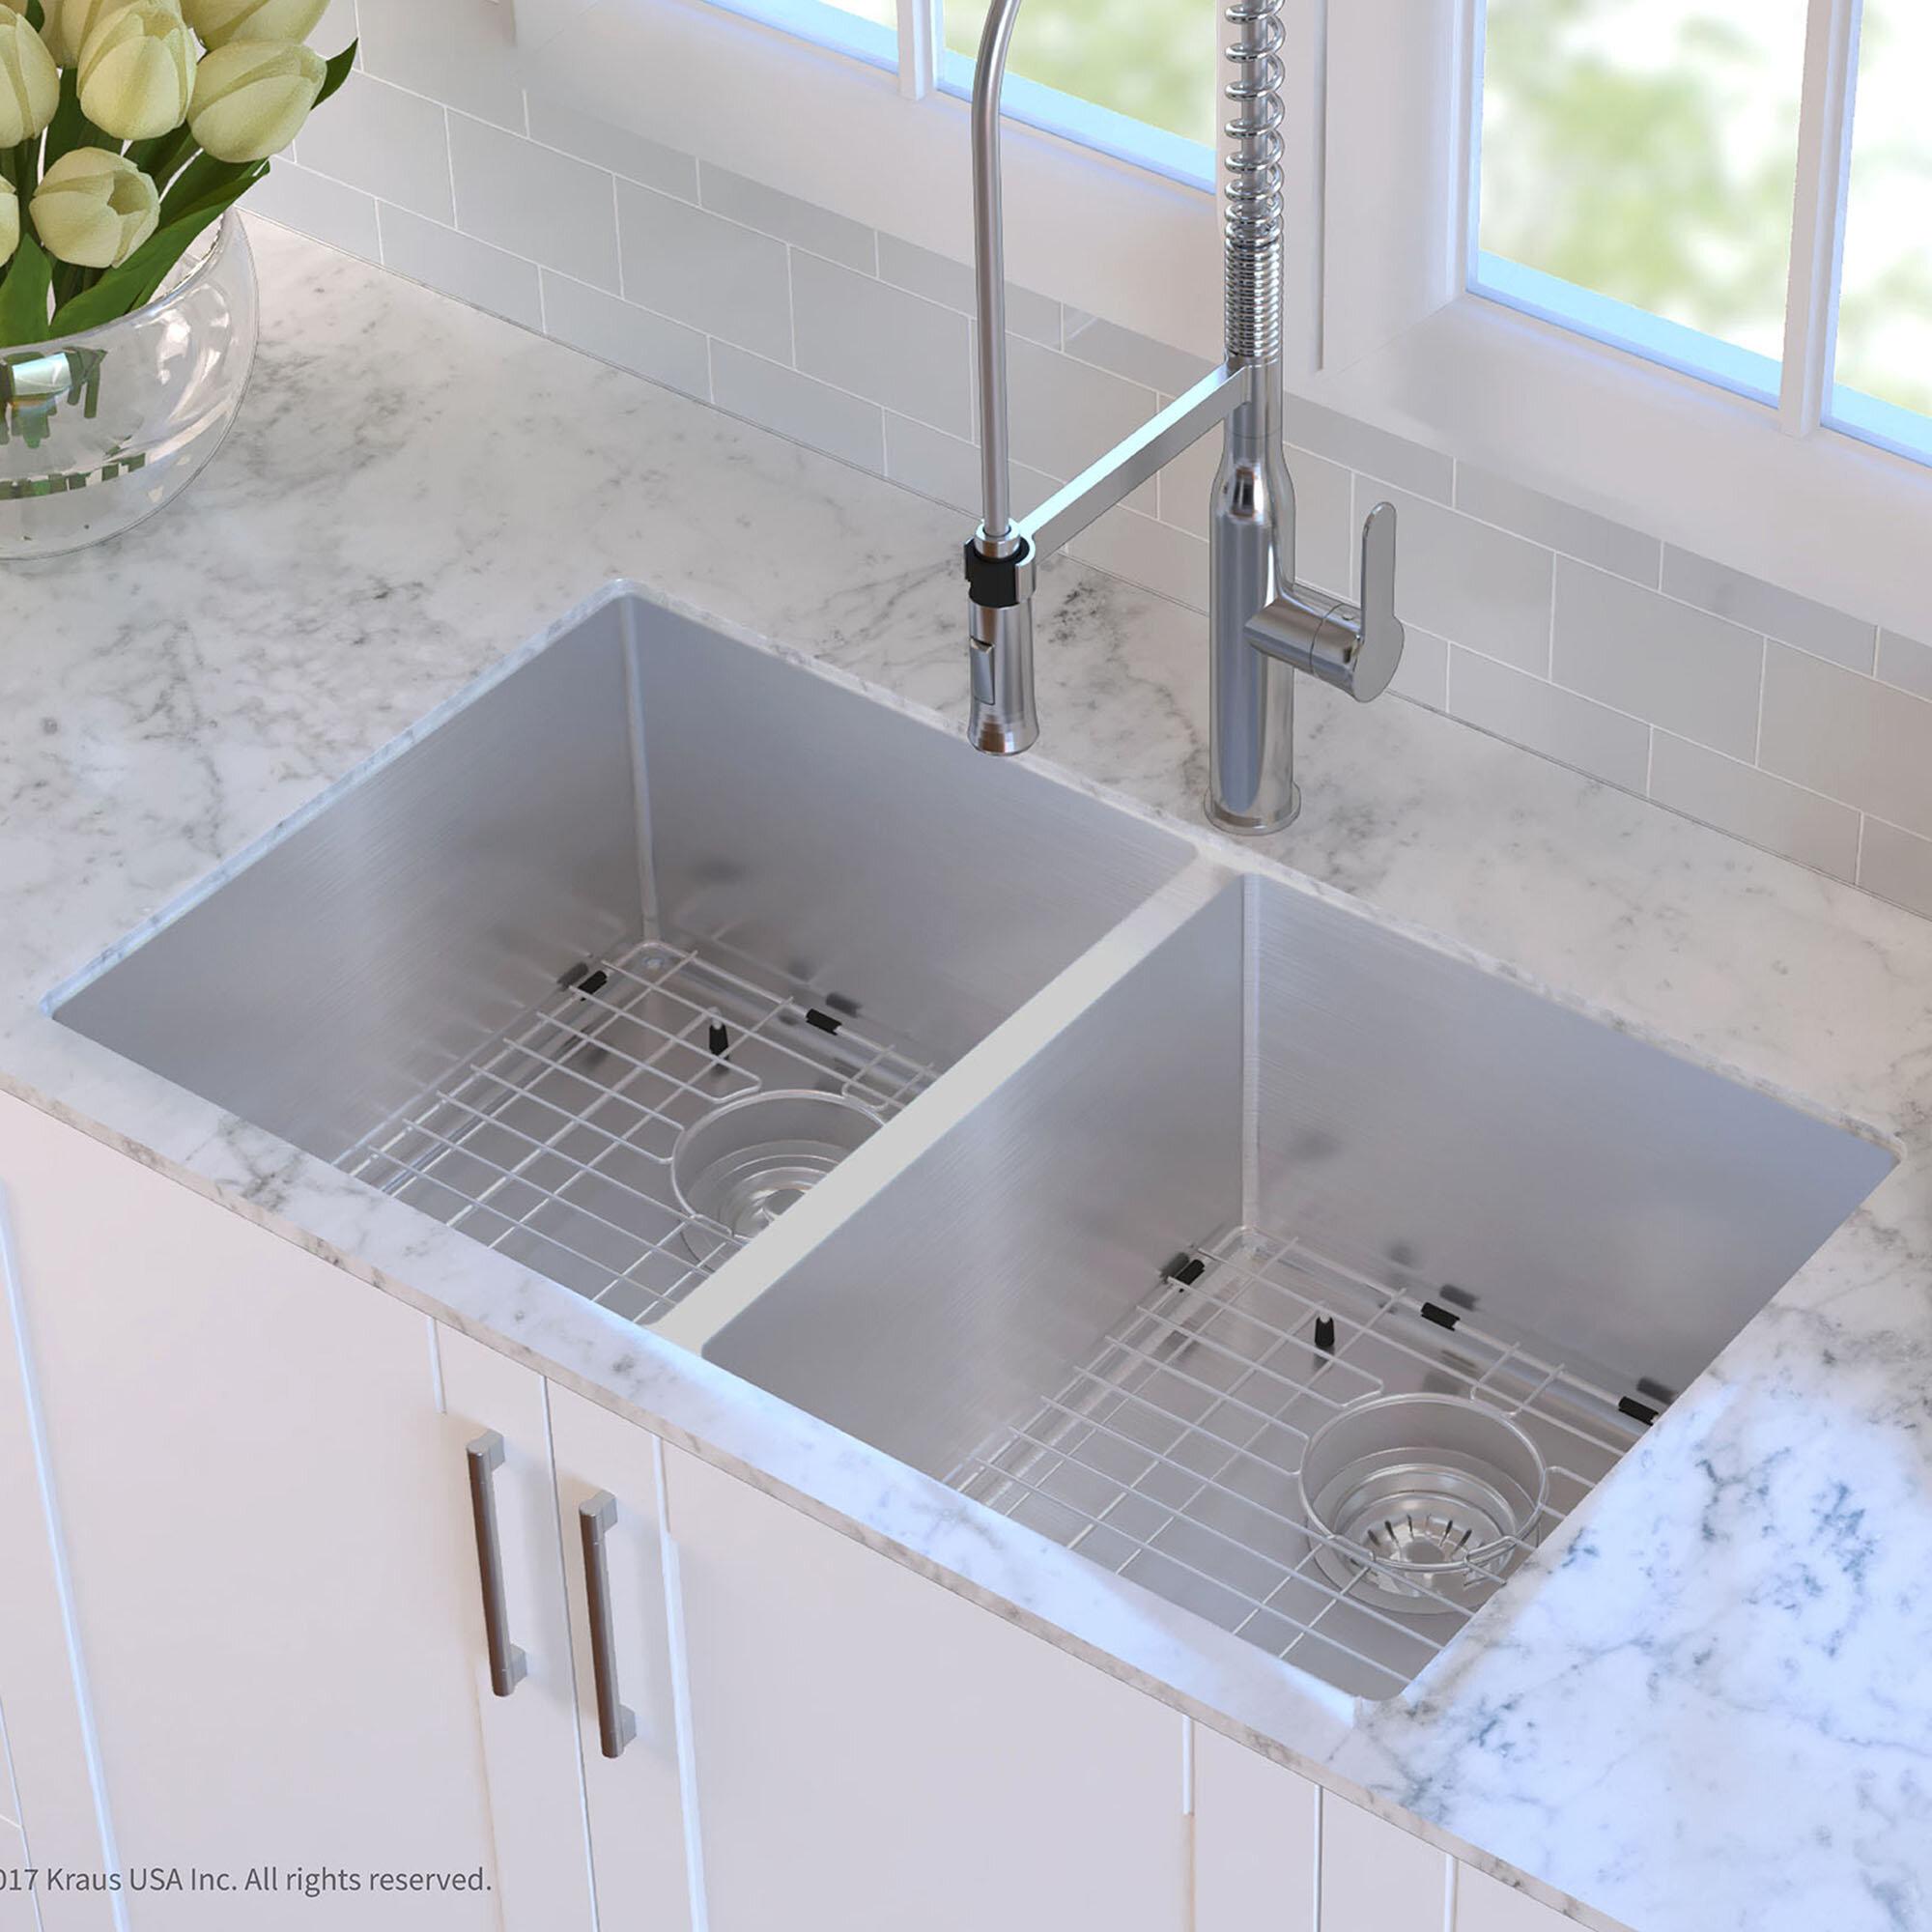 kraus 33   x 19   double basin undermount kitchen sink with drain assembly  u0026 reviews   wayfair kraus 33   x 19   double basin undermount kitchen sink with drain      rh   wayfair com